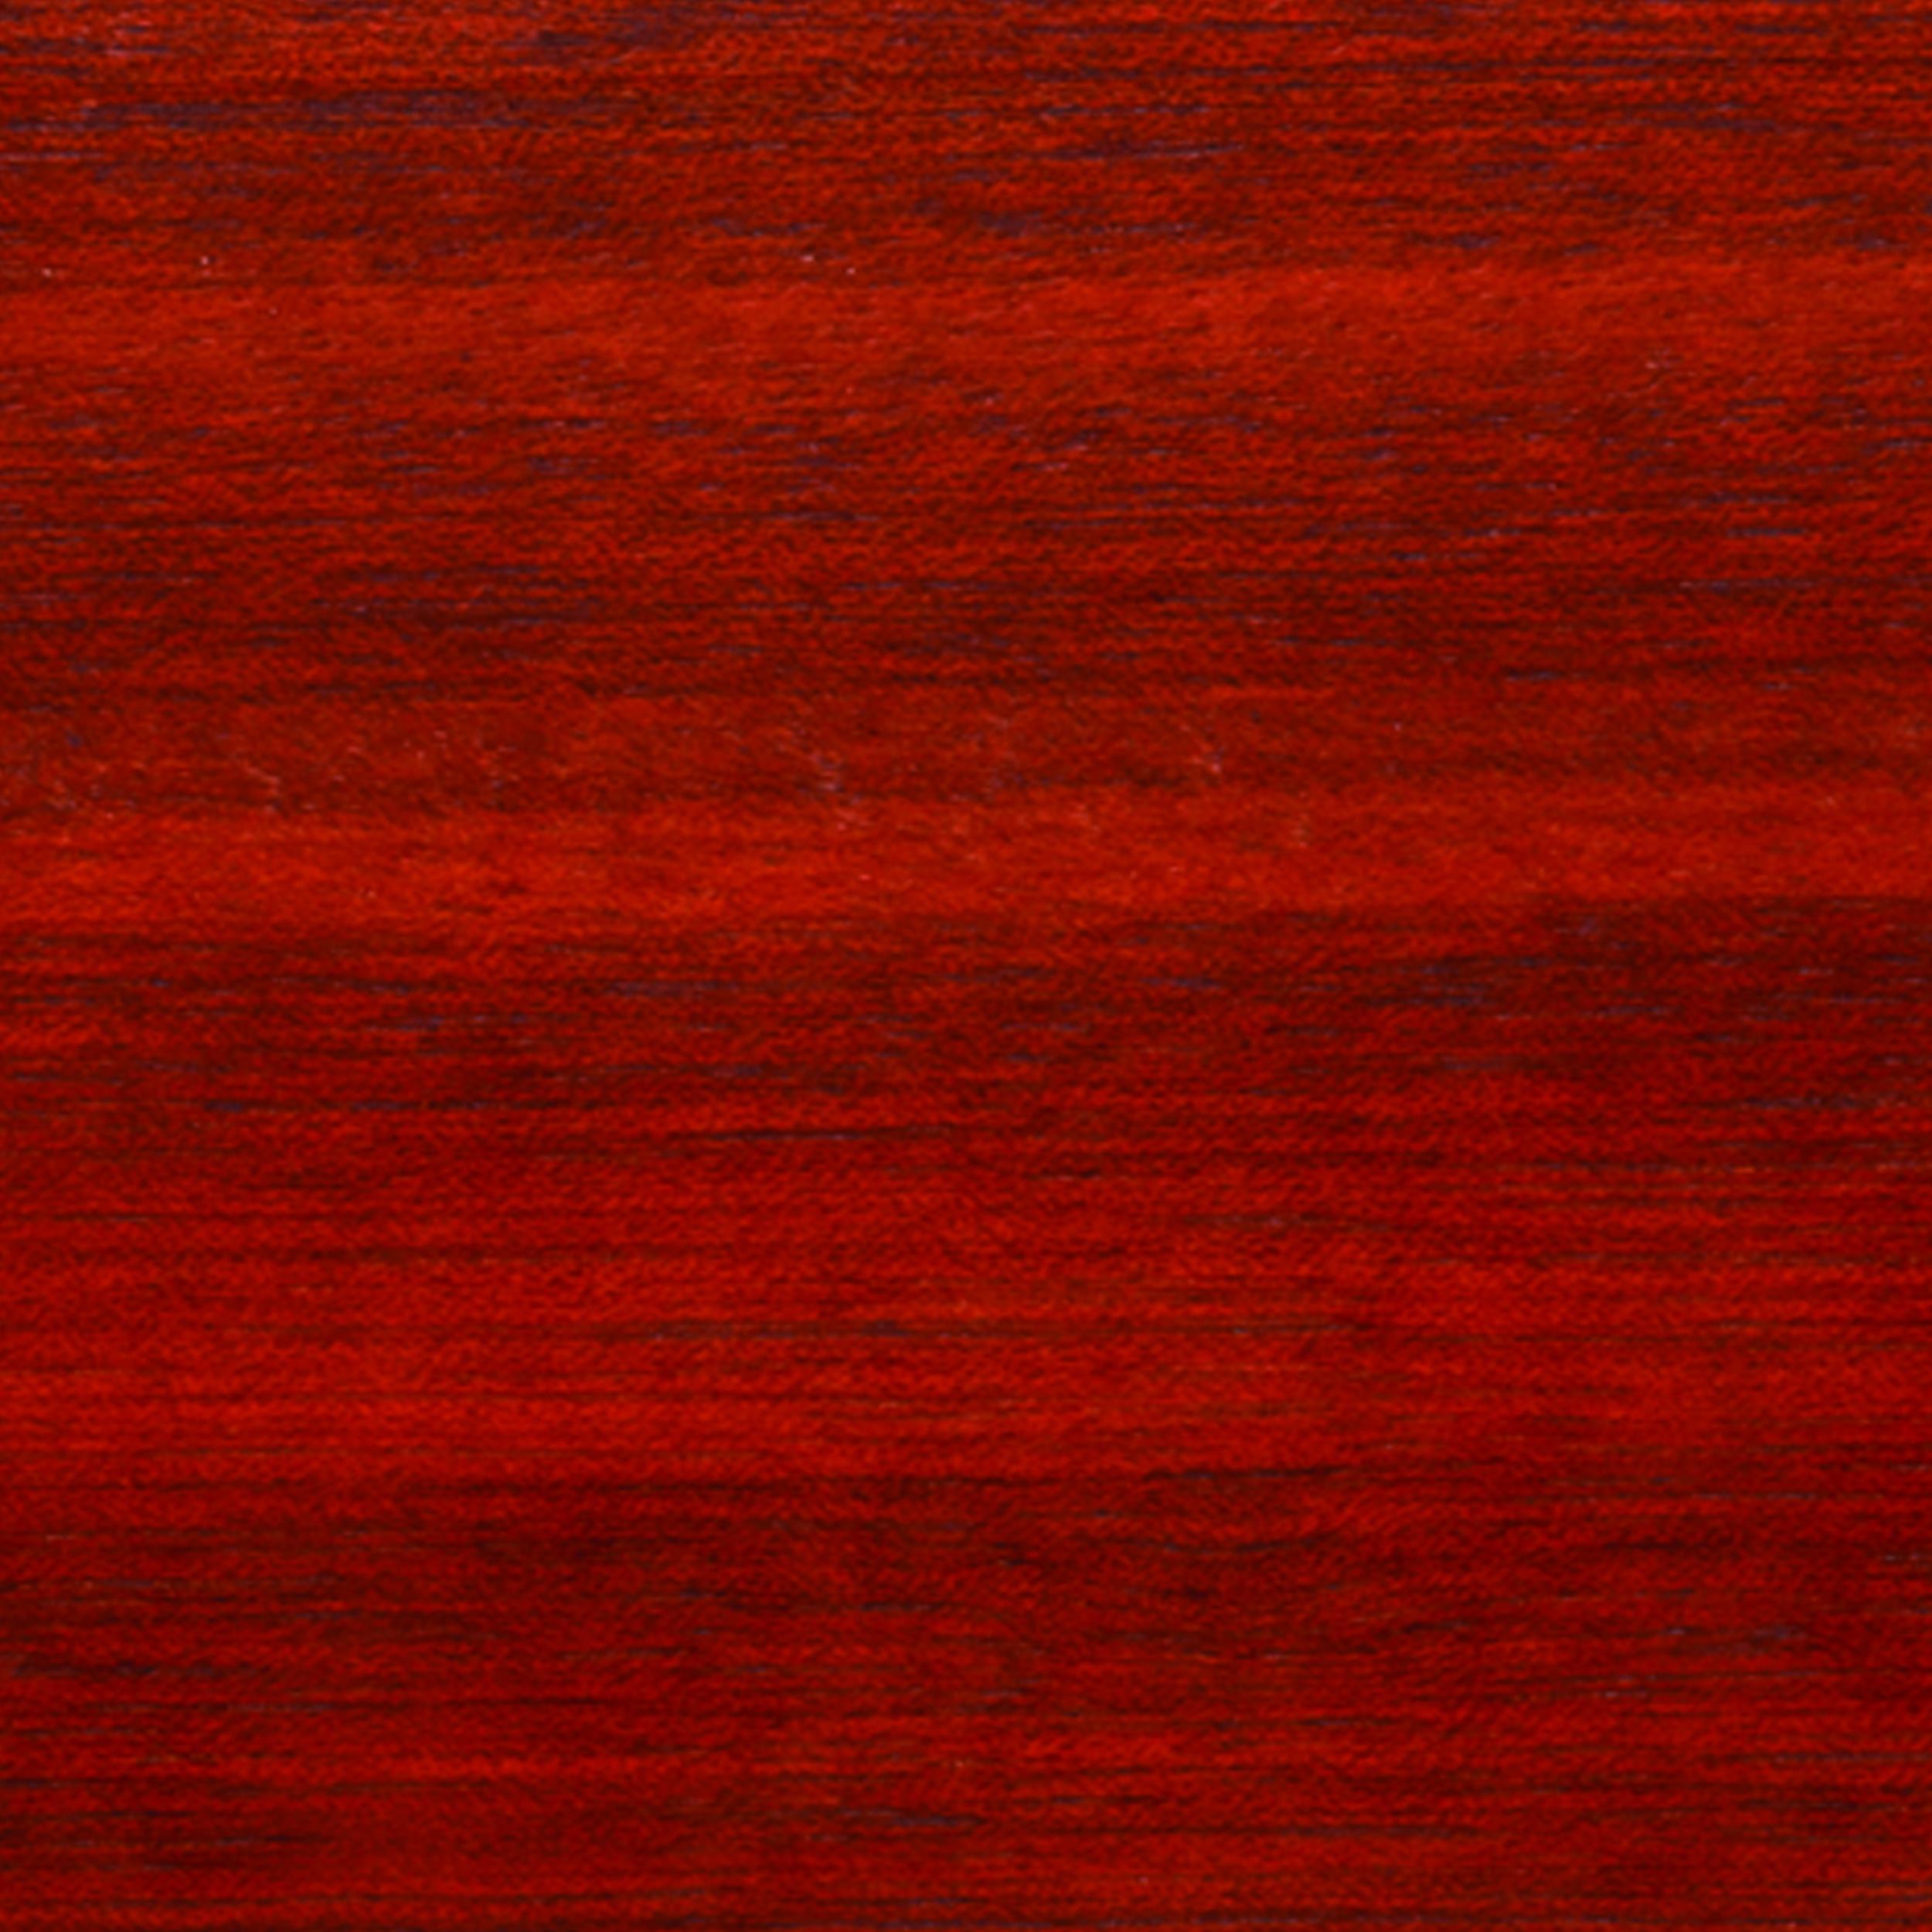 Bloodwood 1/4